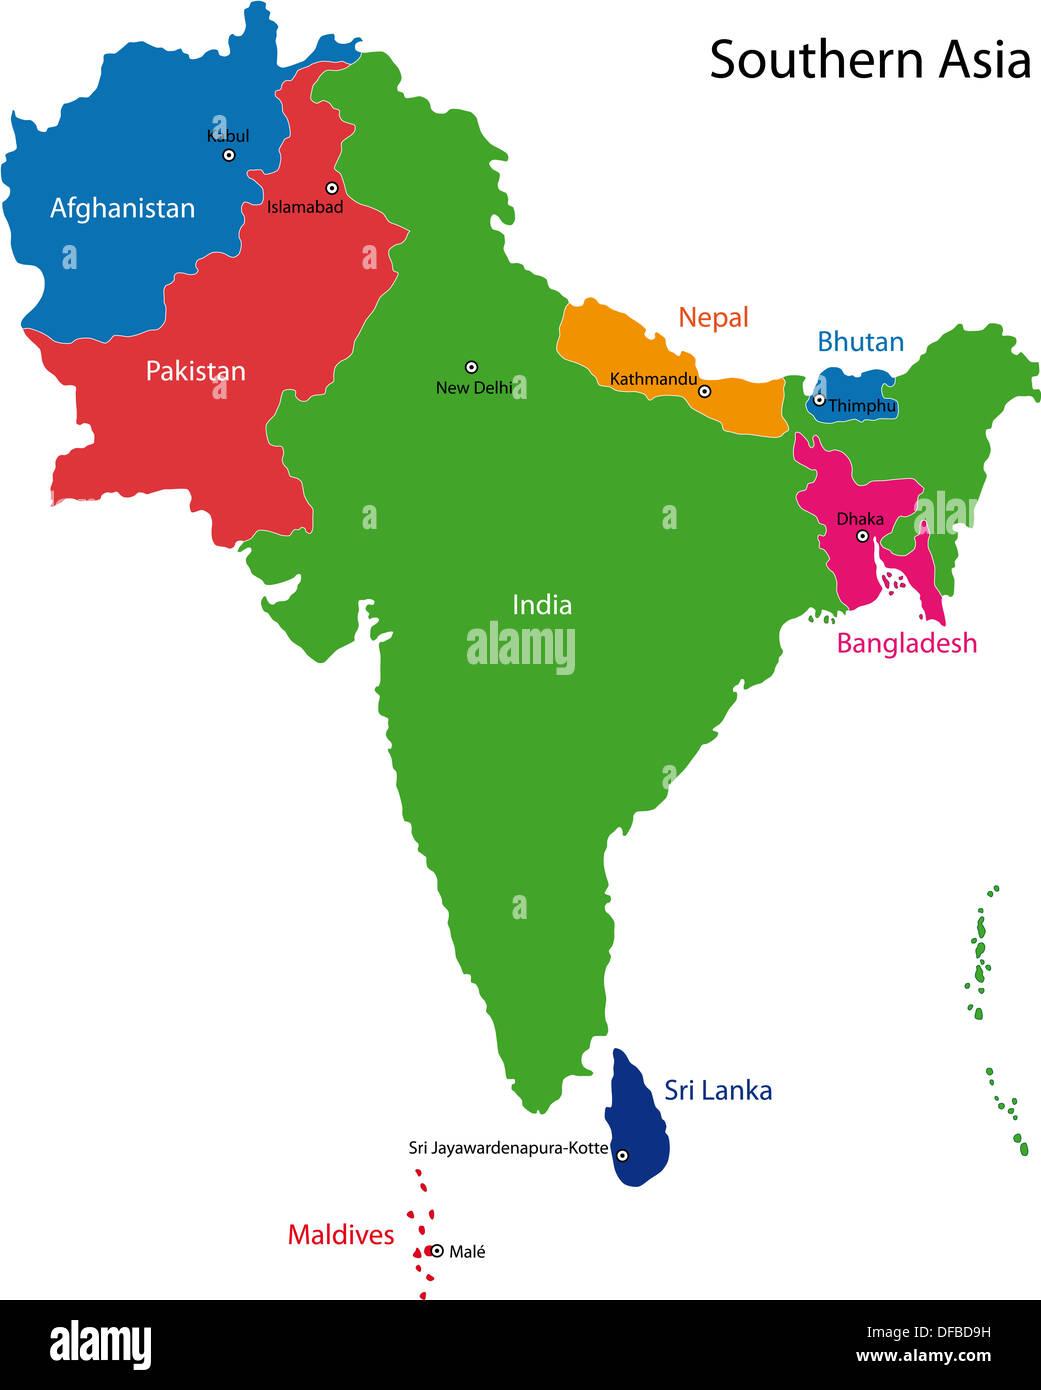 Südasien Karte.Südasien Karte Stockfoto Bild 61102877 Alamy